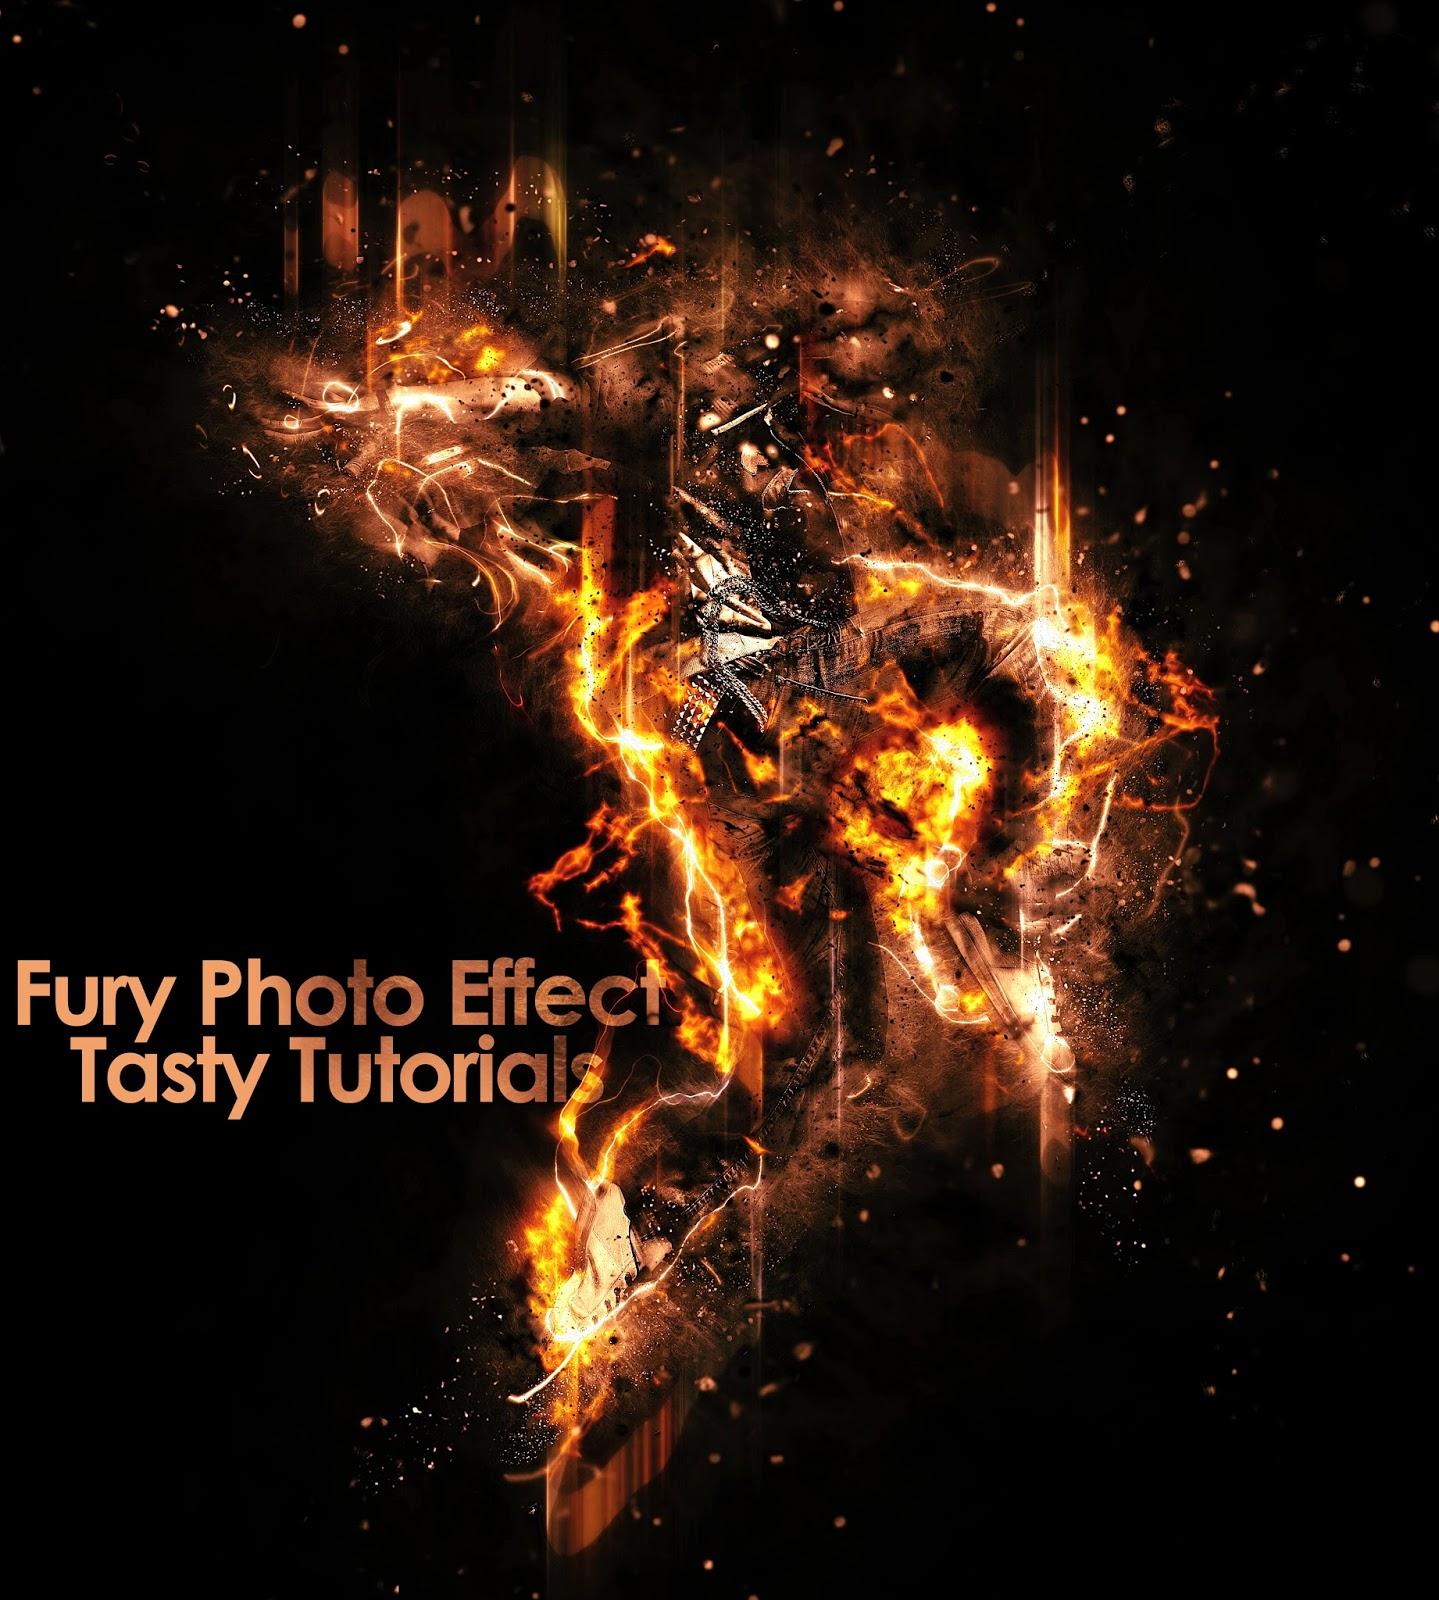 photoshop cs6 photo effects tutorials pdf